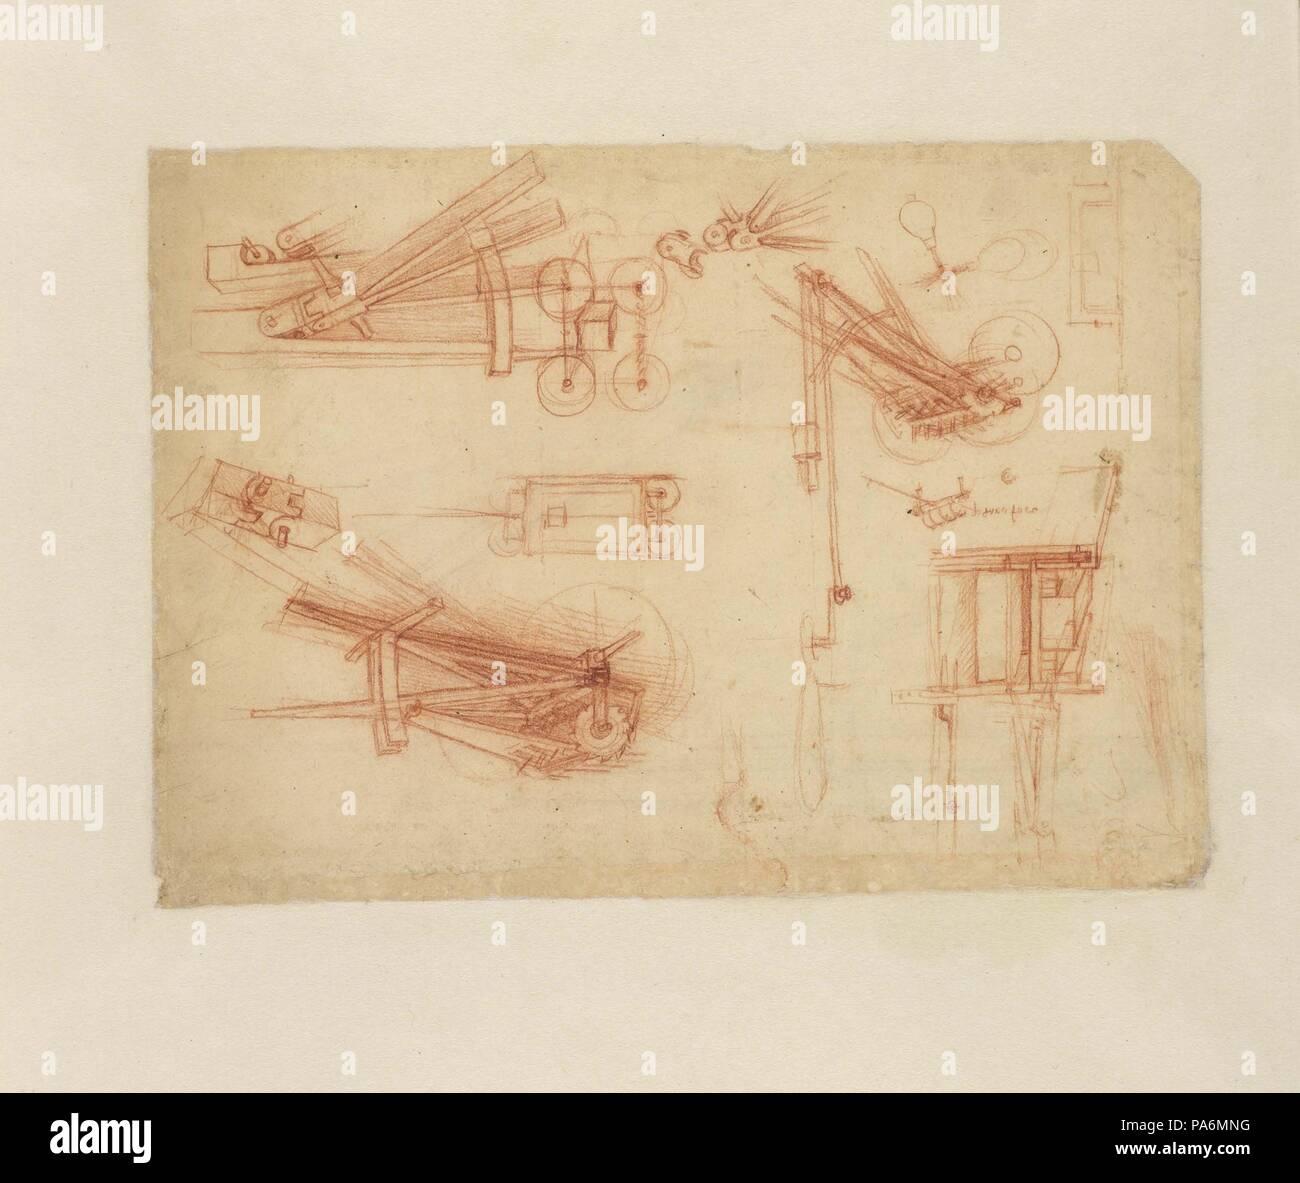 Biblioteca Ambrosiana Stock Photos Catapult Diagram Viewing Gallery Catapults Museum Veneranda Image